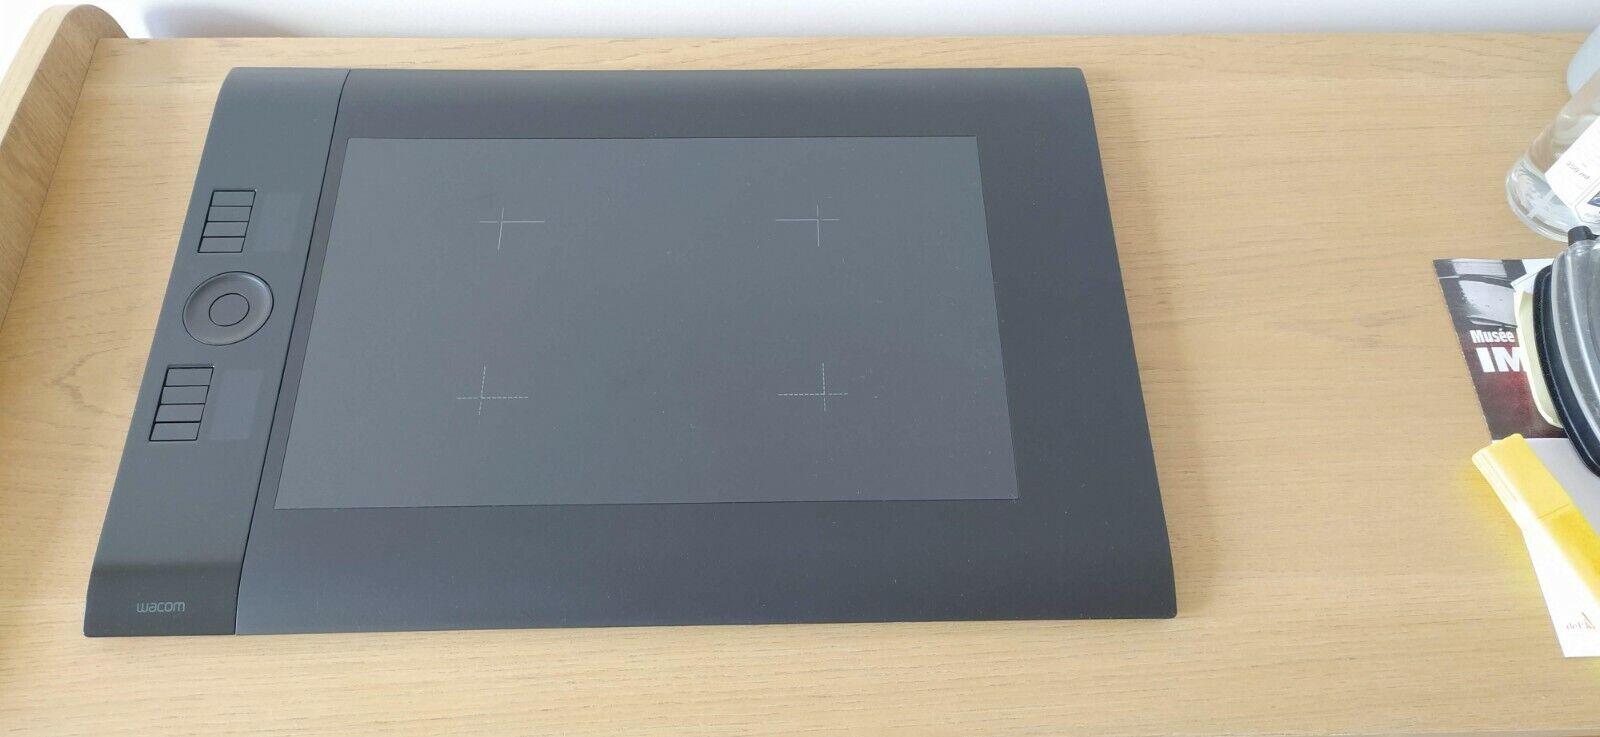 Tablette graphique wacom intuos 4 taille l